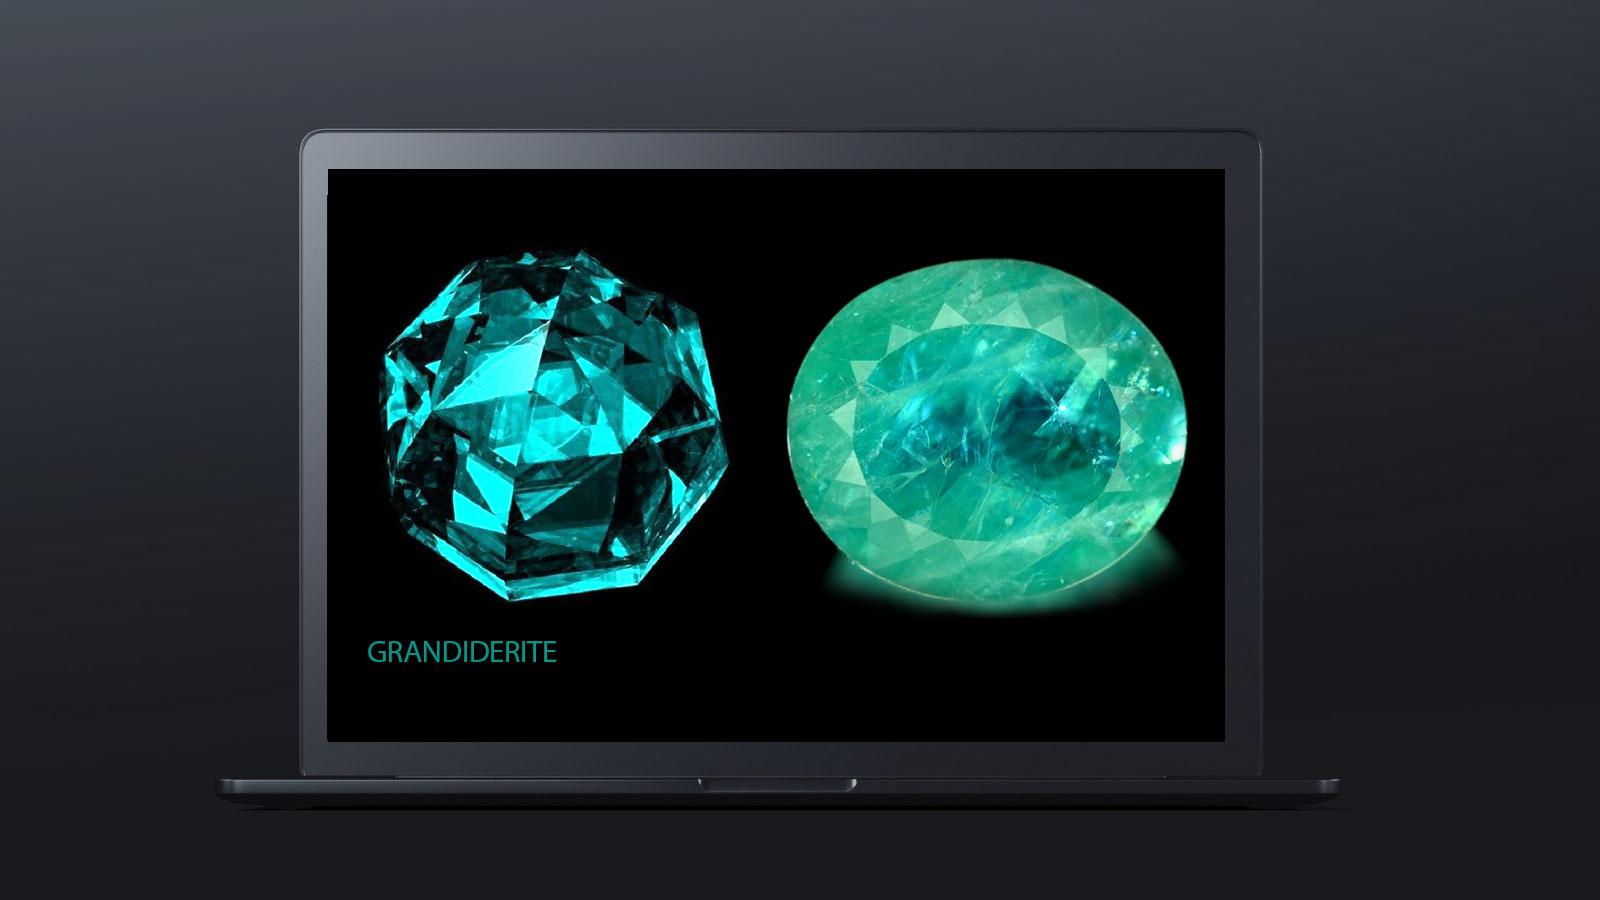 10 worlds rarest gemstones GRANDIDERITE 2 - ده گوهر کمیاب دنیا کدامند؟